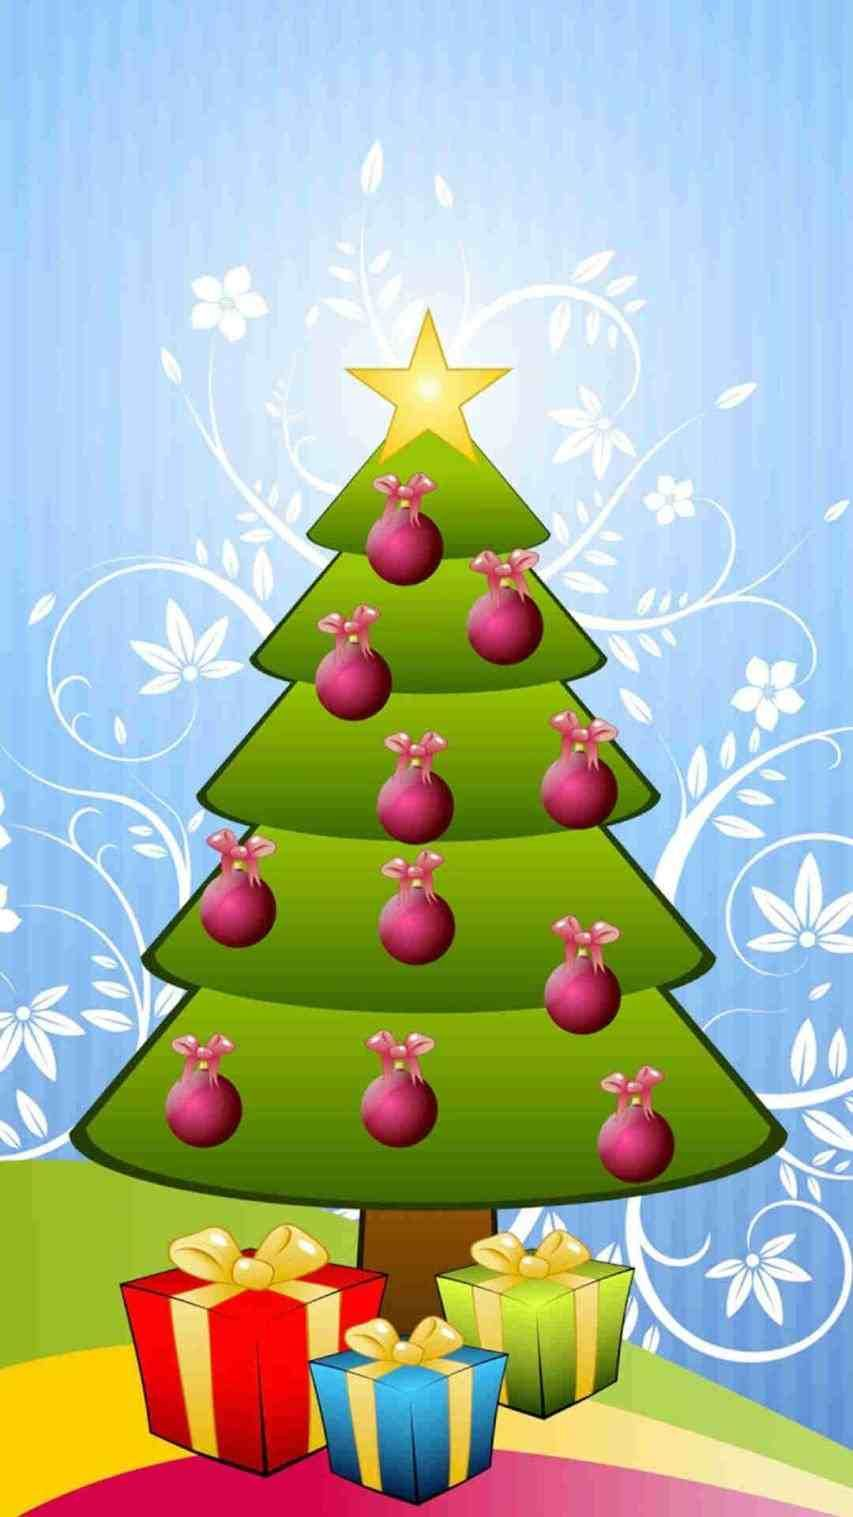 Cute Christmas Tree Wallpapers Top Free Cute Christmas Tree Backgrounds Wallpaperaccess